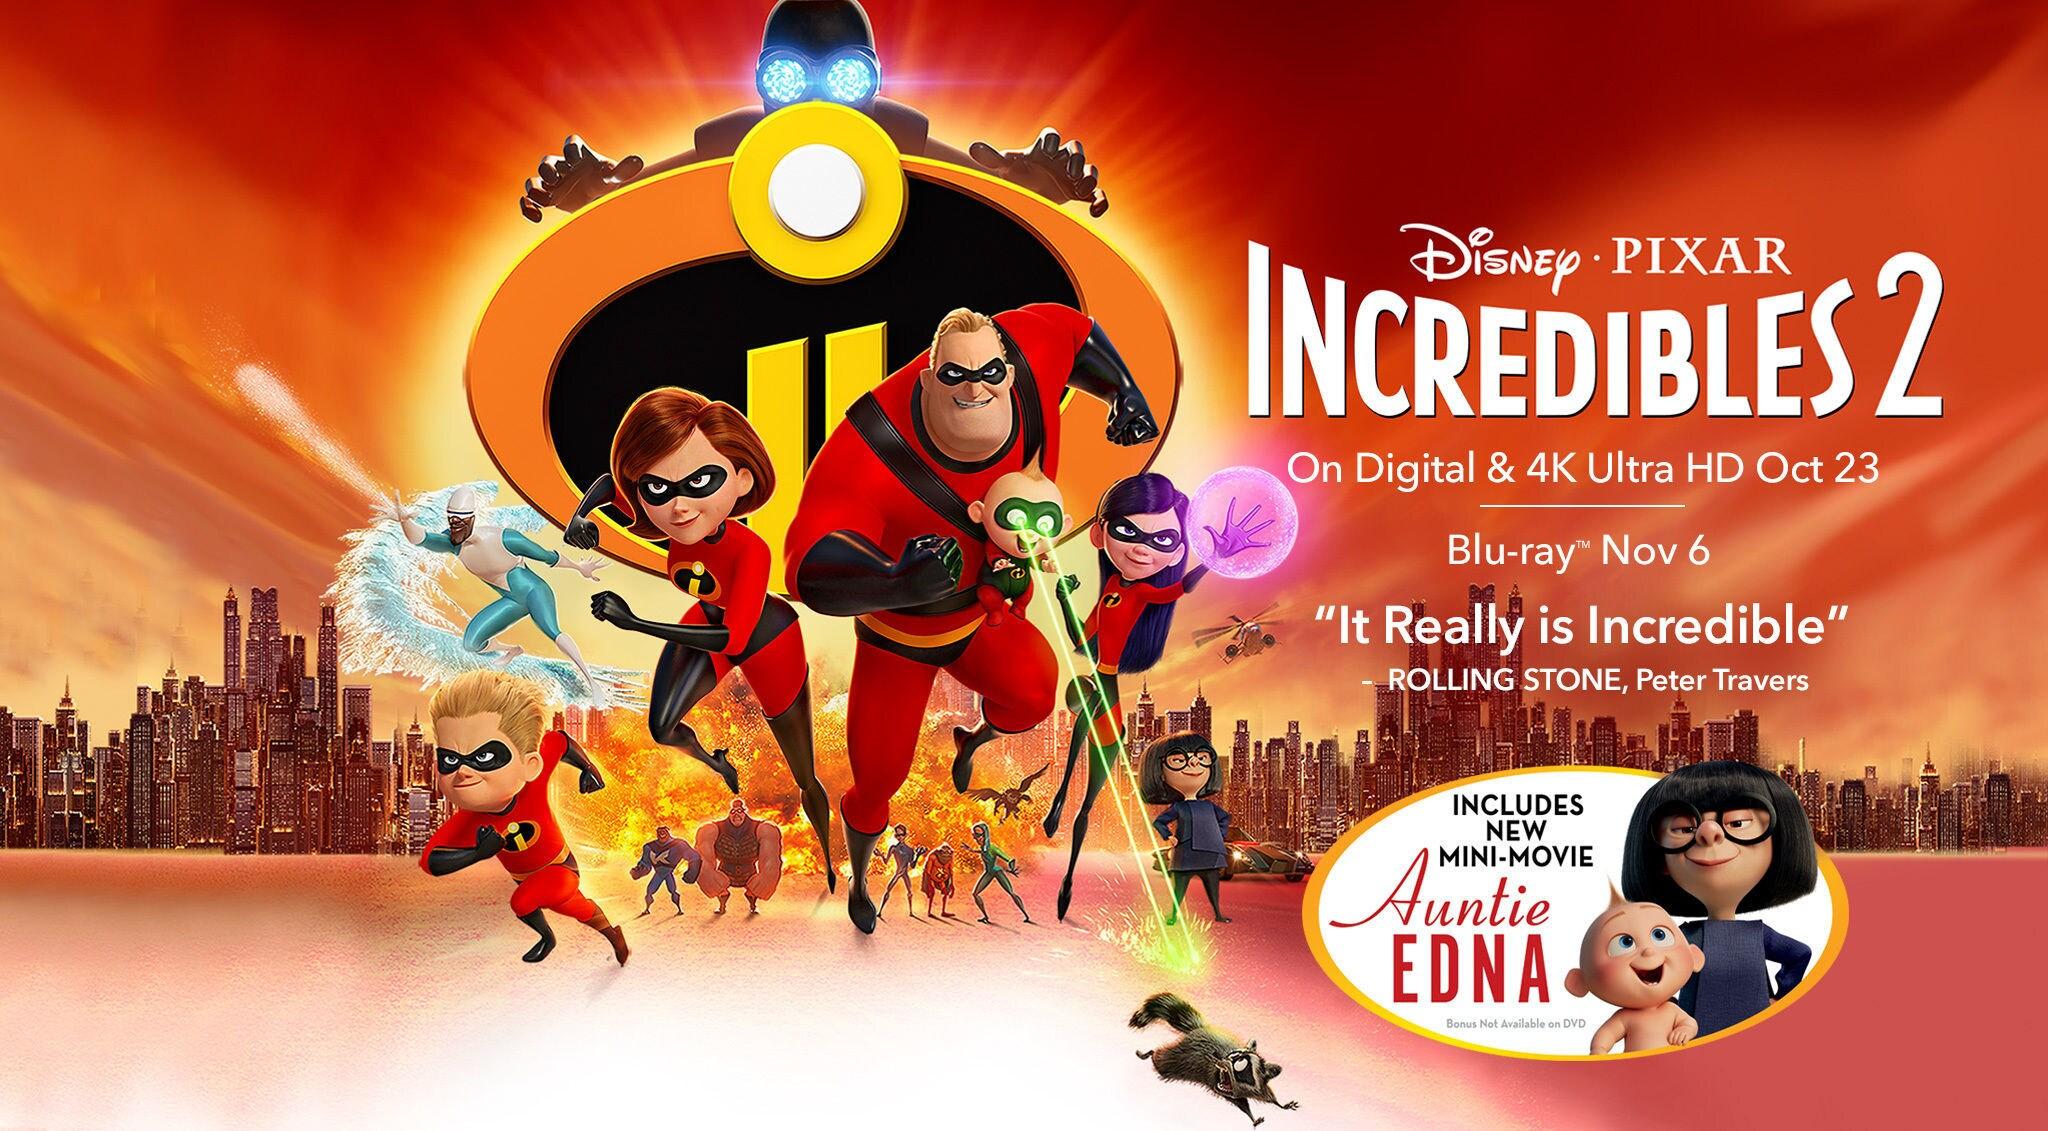 Disney O Pixar Incredibles 2 On Digital 4K Ultra HD Oct 23